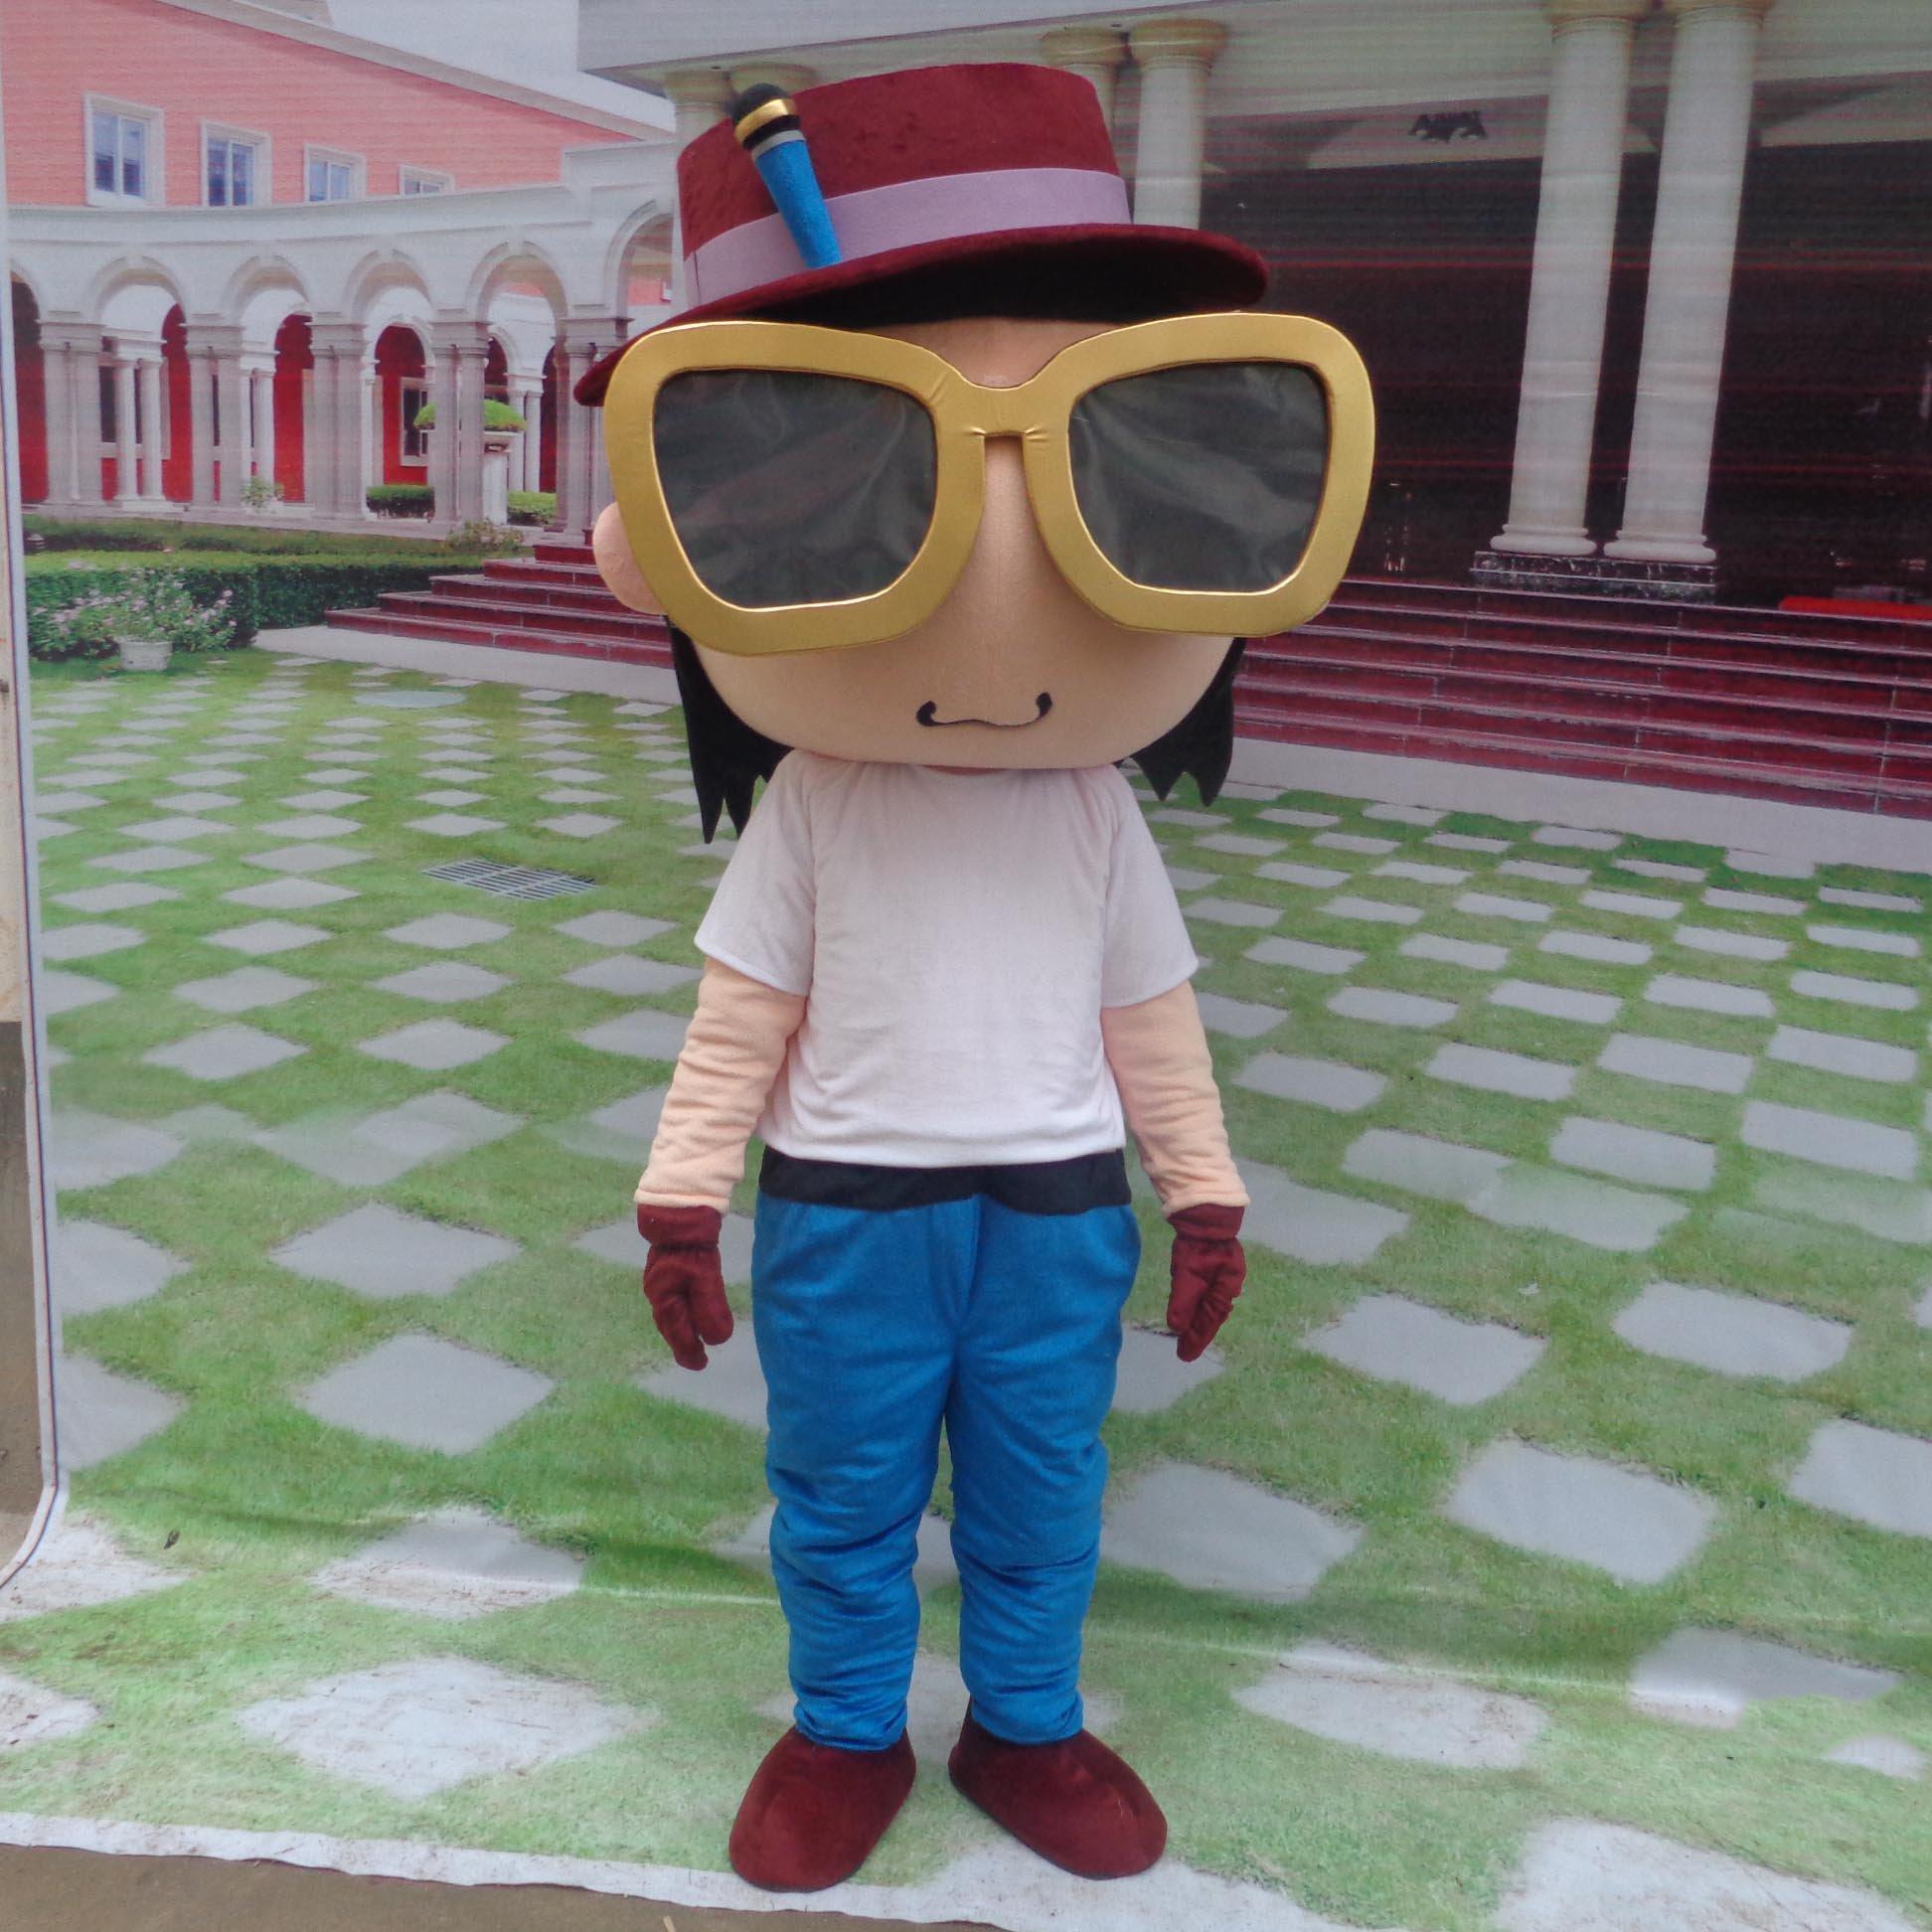 Cartoon Mascot Character Cartoon Walking Doll Clothing Doll Clothing Cartoon Show Clothing Doll Clothes Mascot Costume